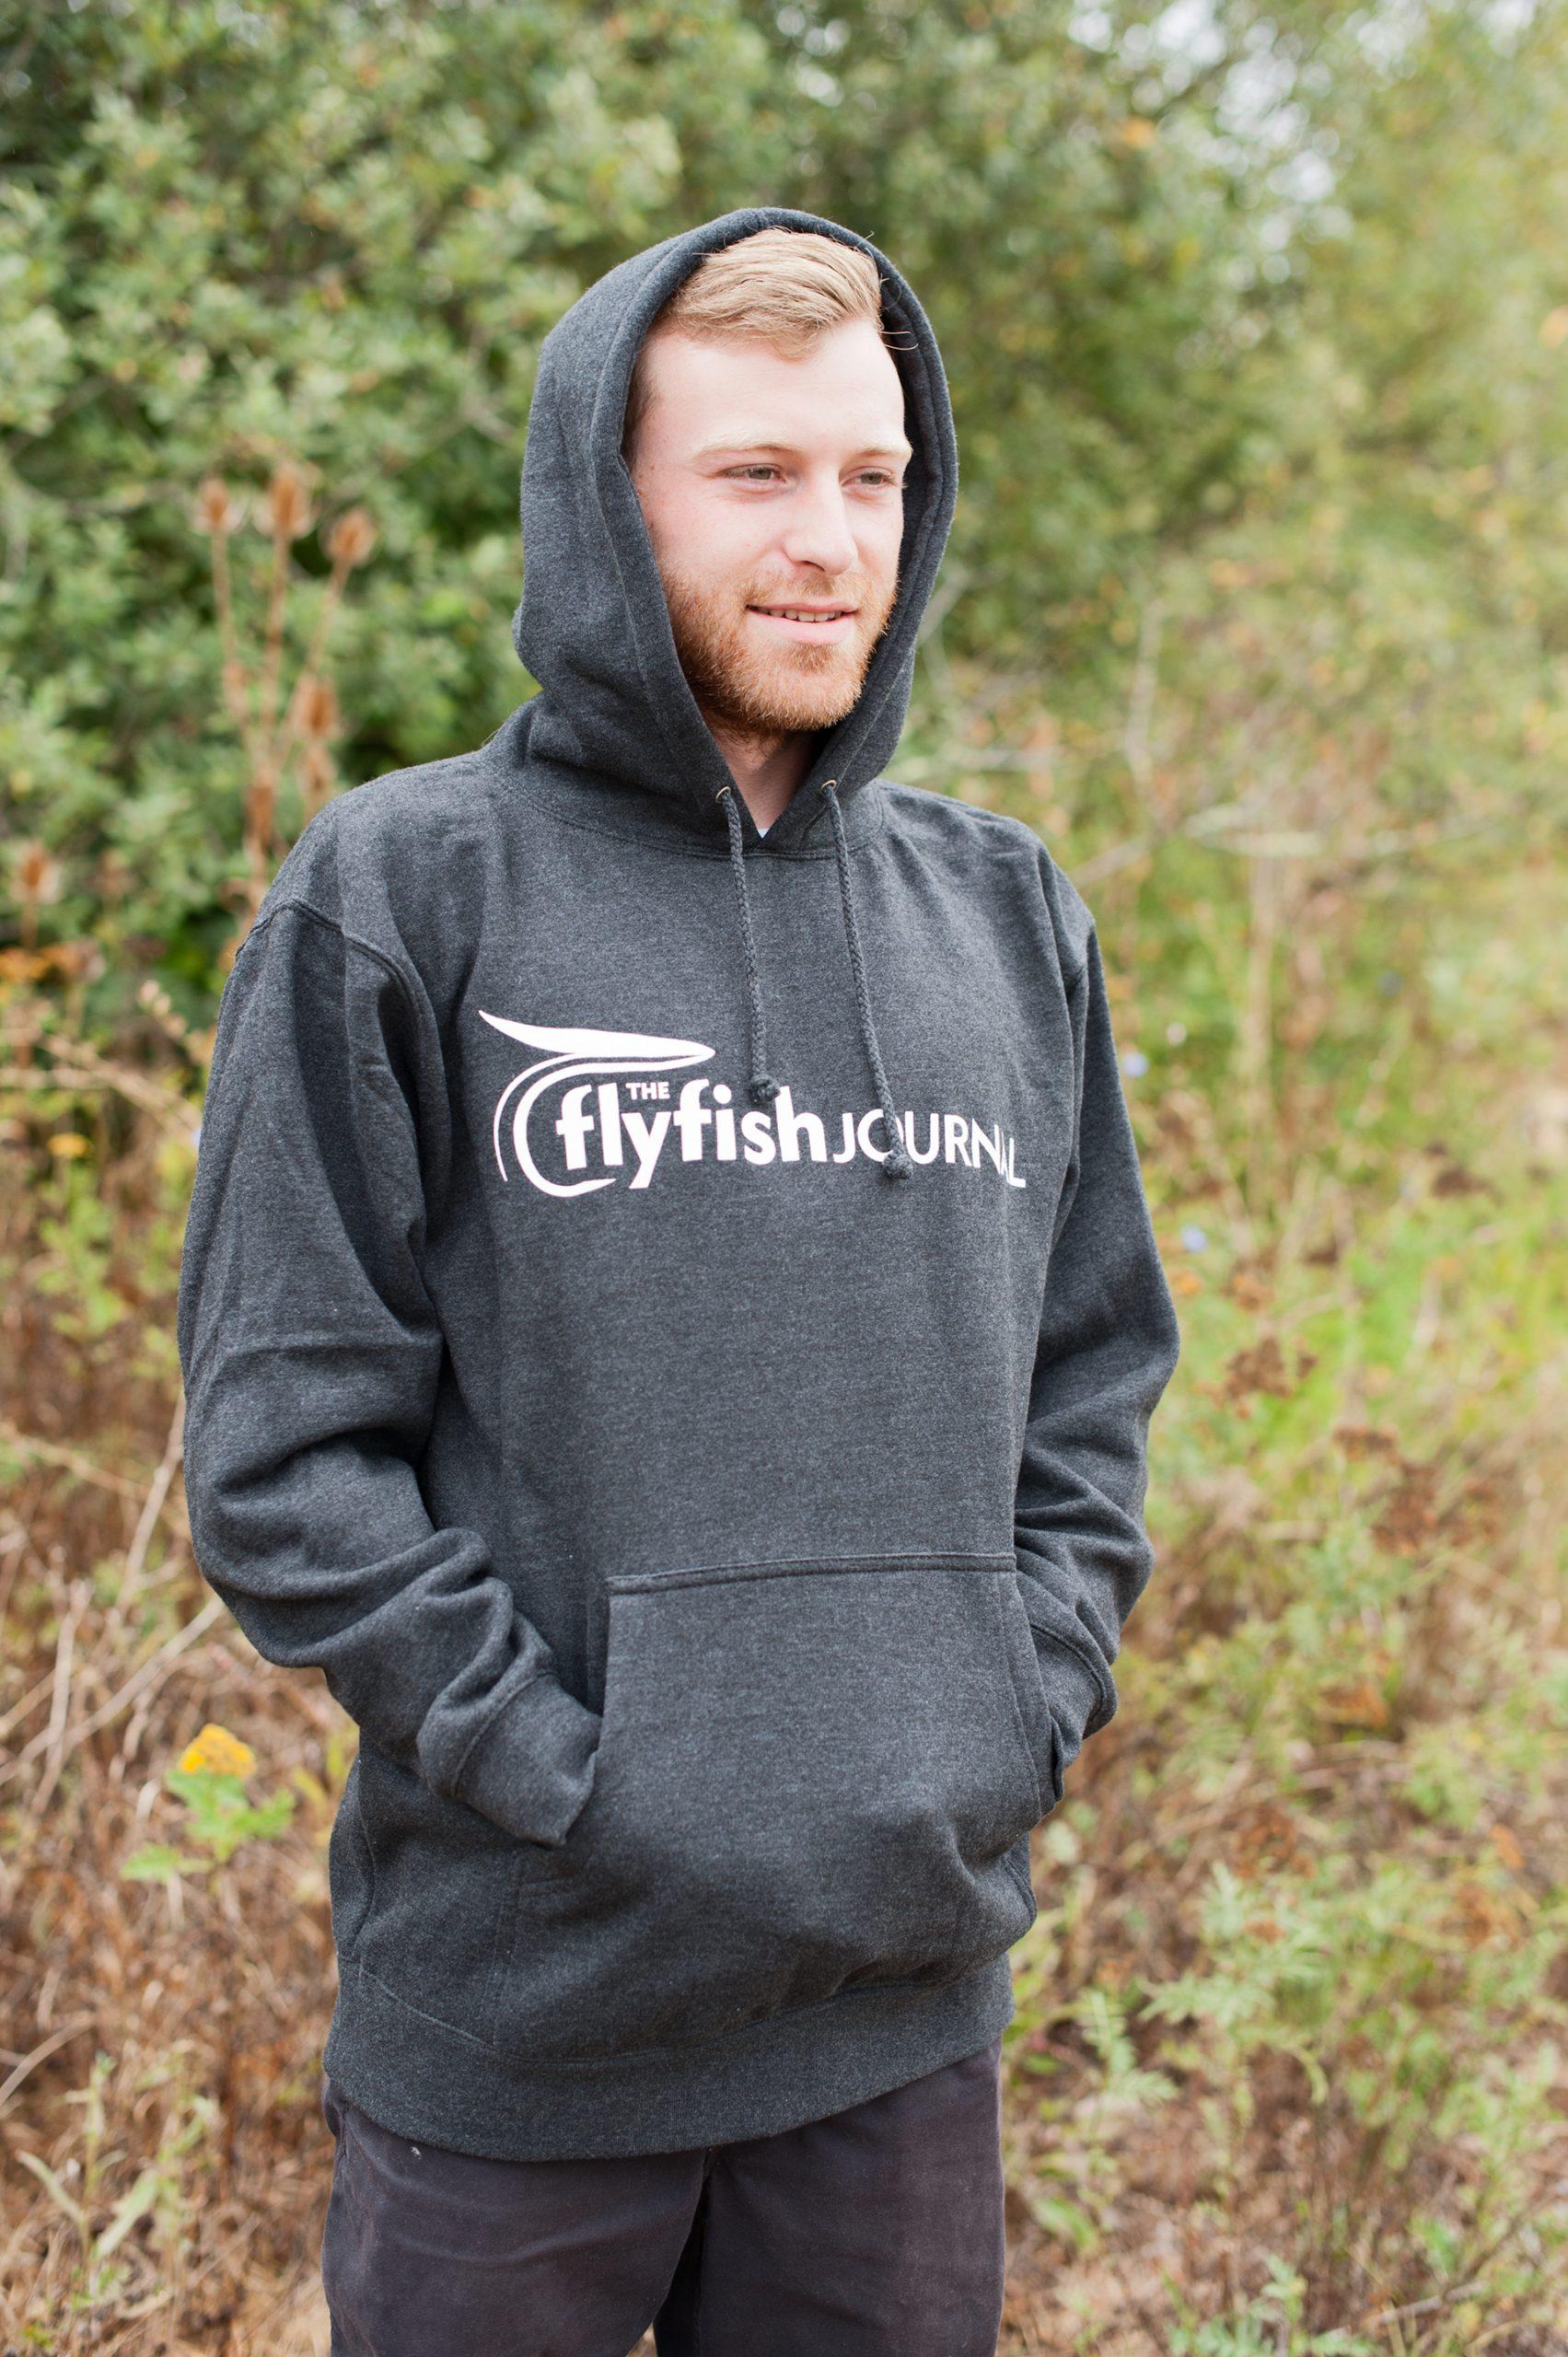 The Flyfish Journal logo hoodie.